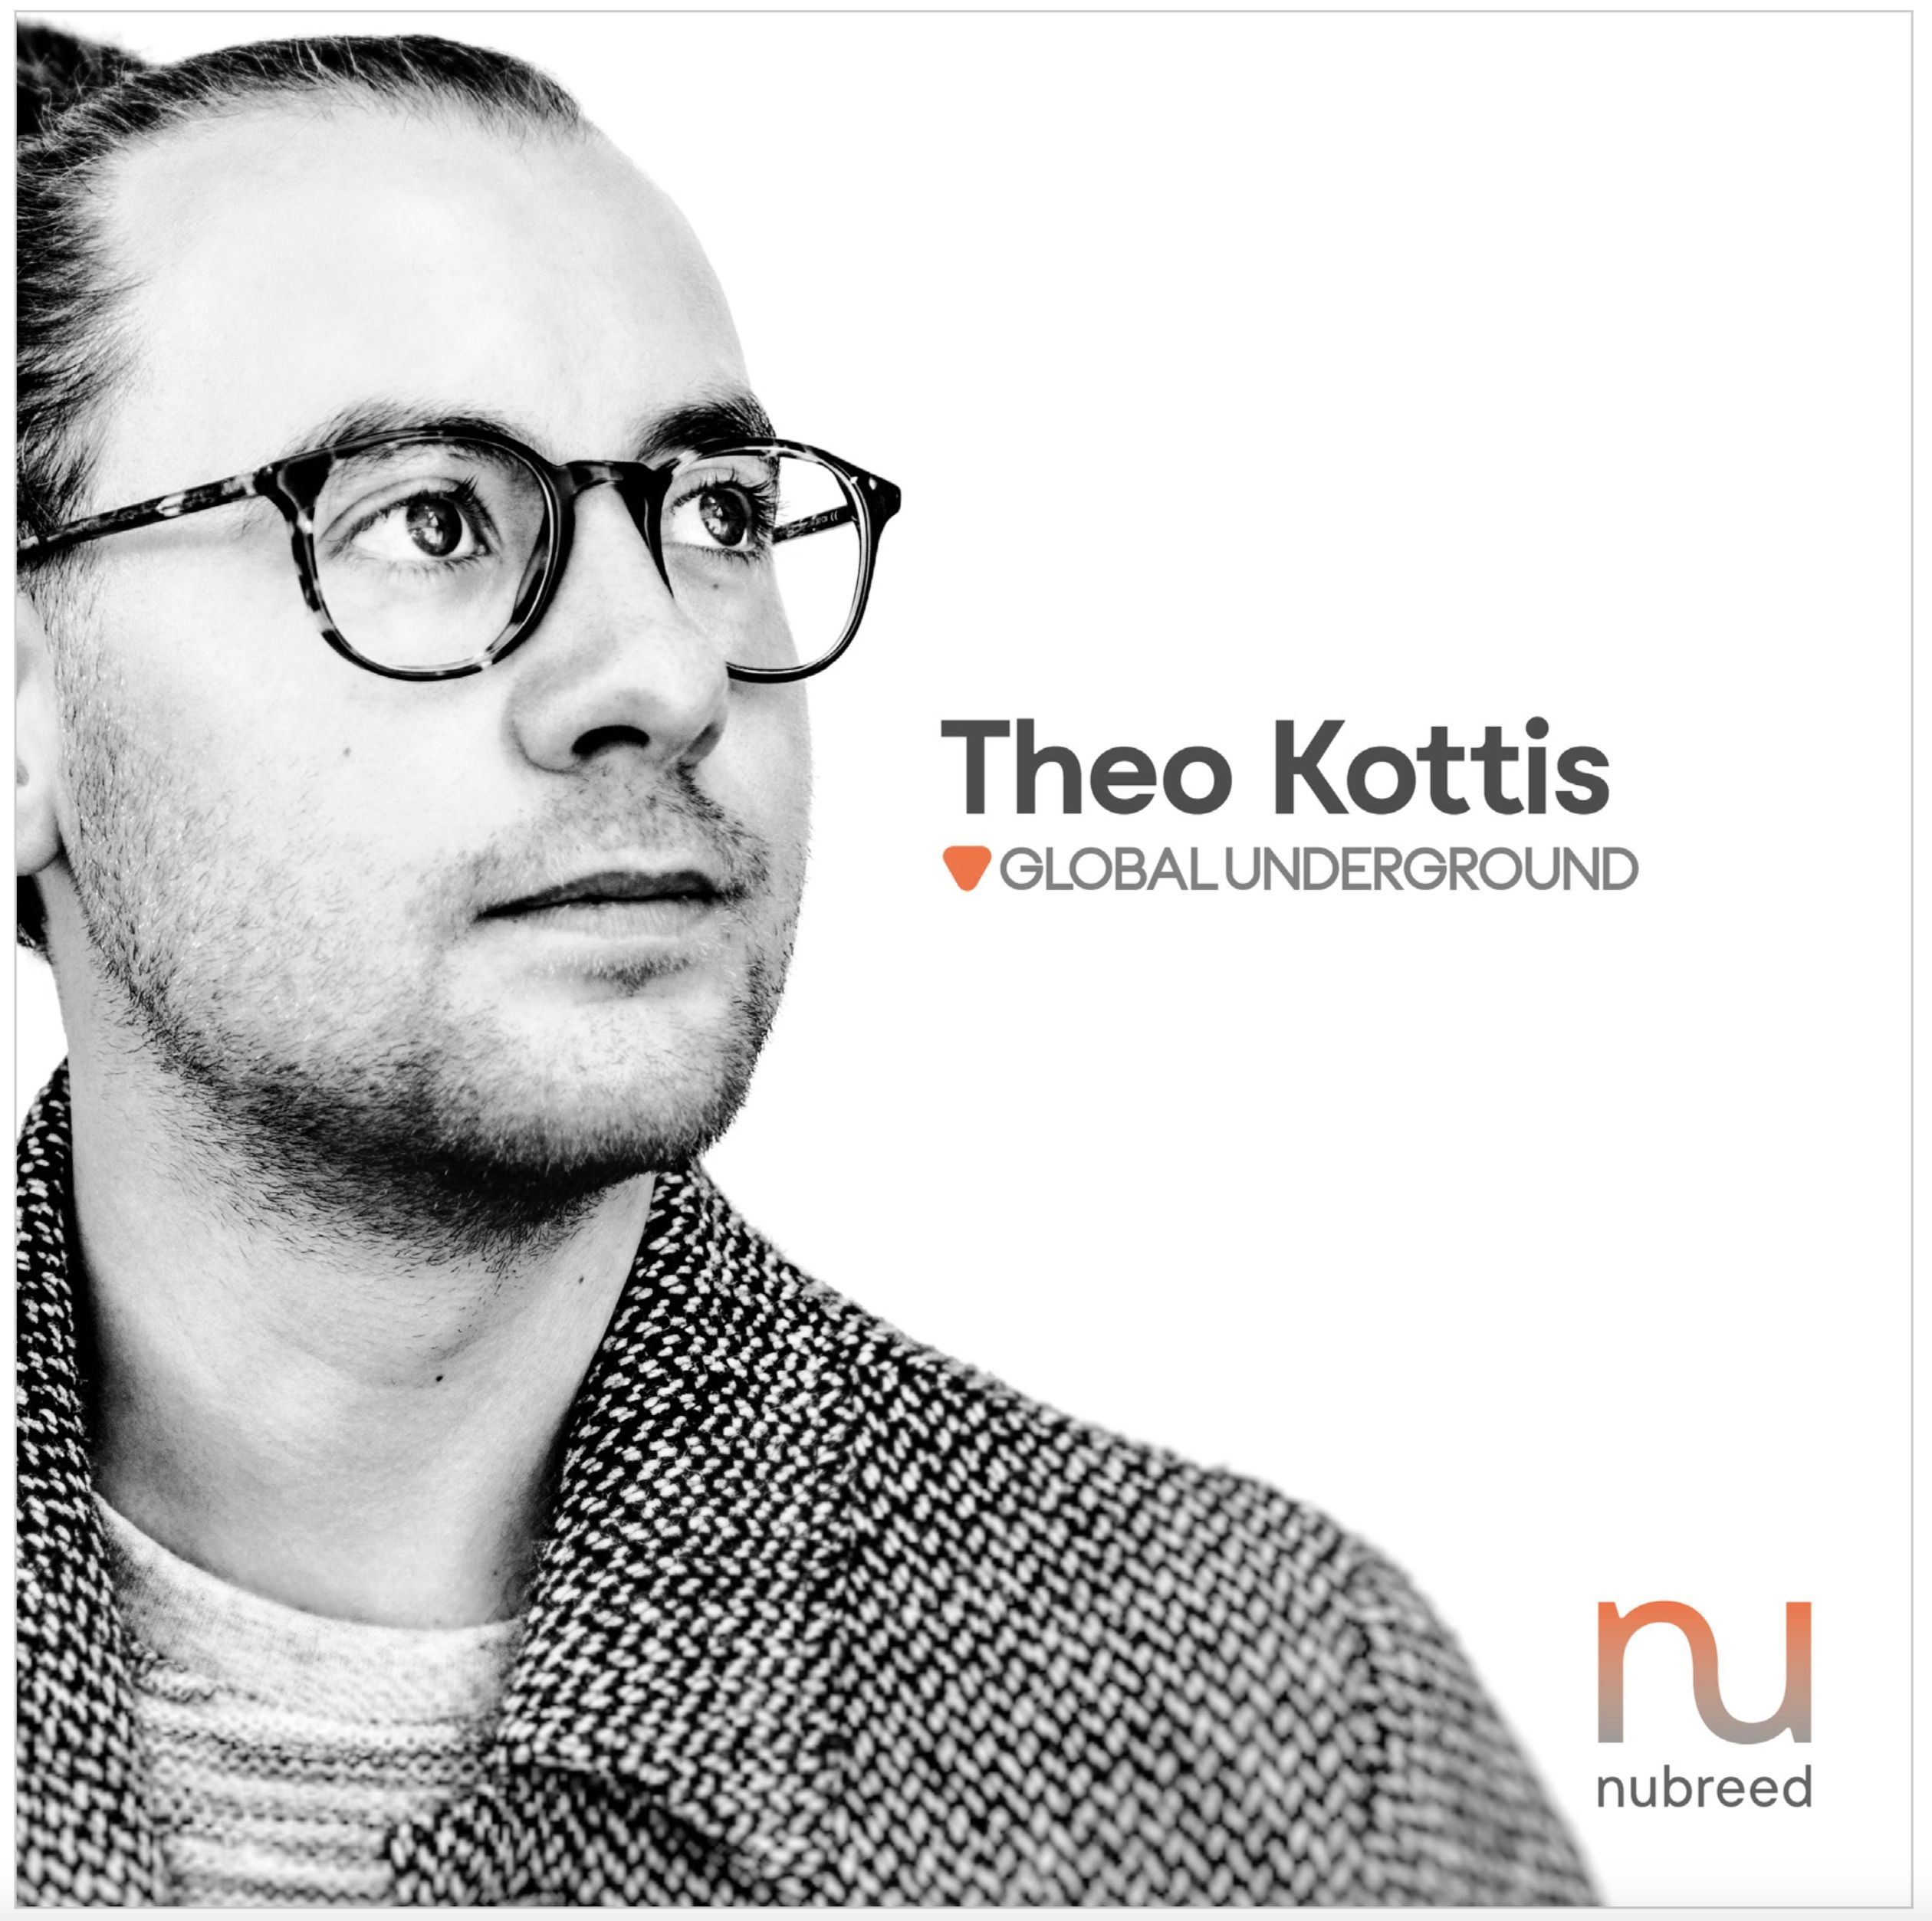 theo_kottis_nubreed_11_cover.jpg